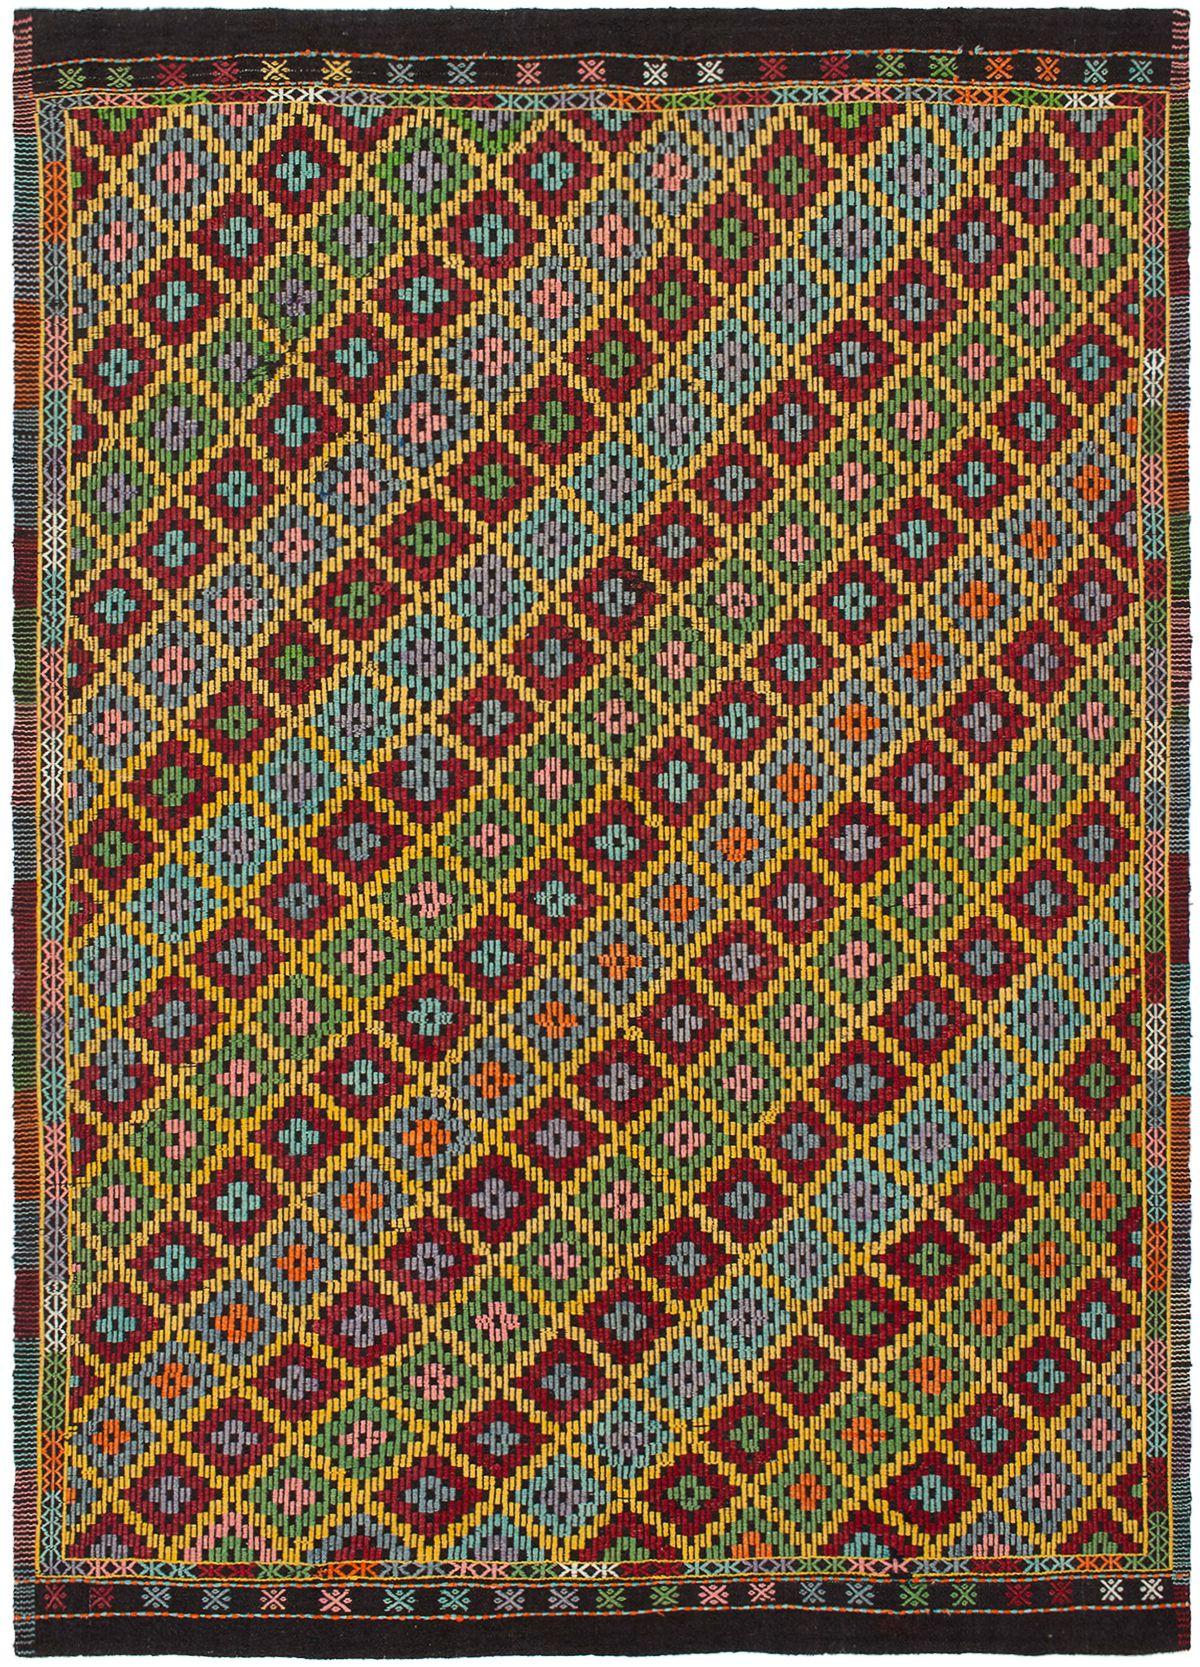 "Hand woven Yoruk Dark Red, Gold Wool Tapestry Kilim 6'9"" x 9'5"" Size: 6'9"" x 9'5"""